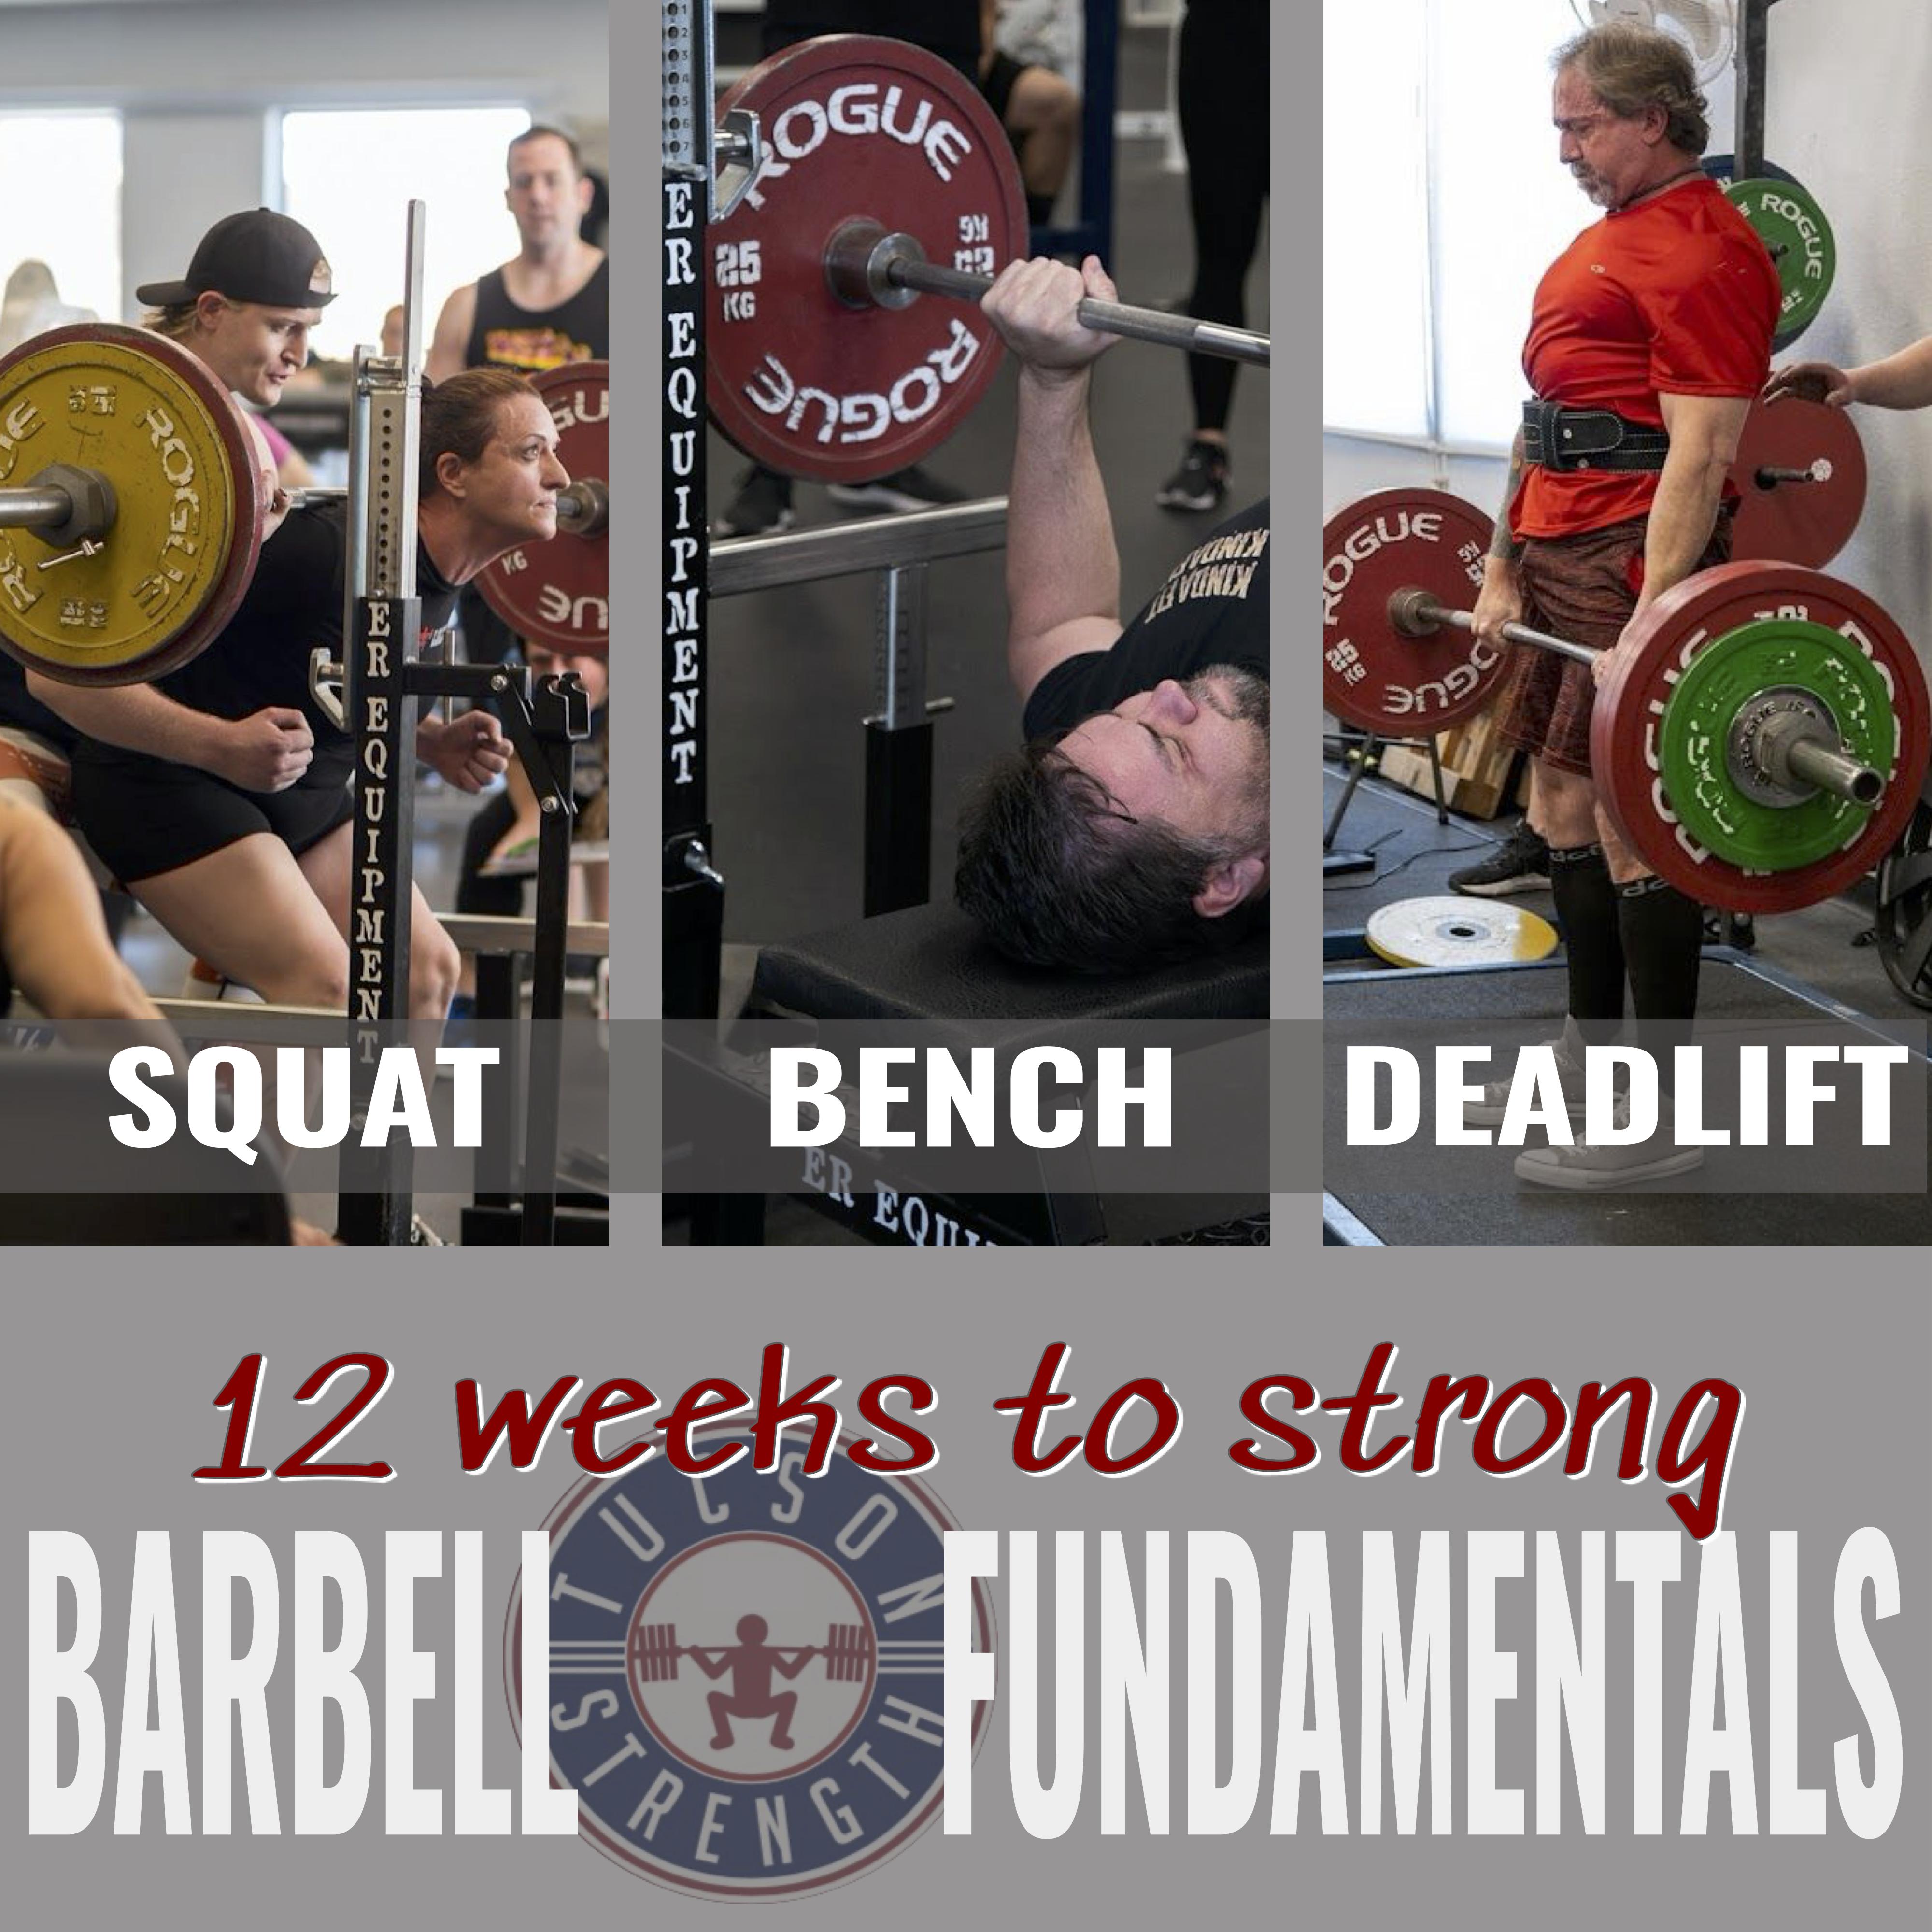 Barbell Strength Training tucson